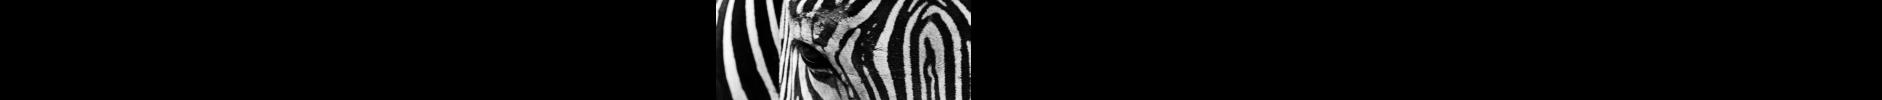 Follow the Zebras